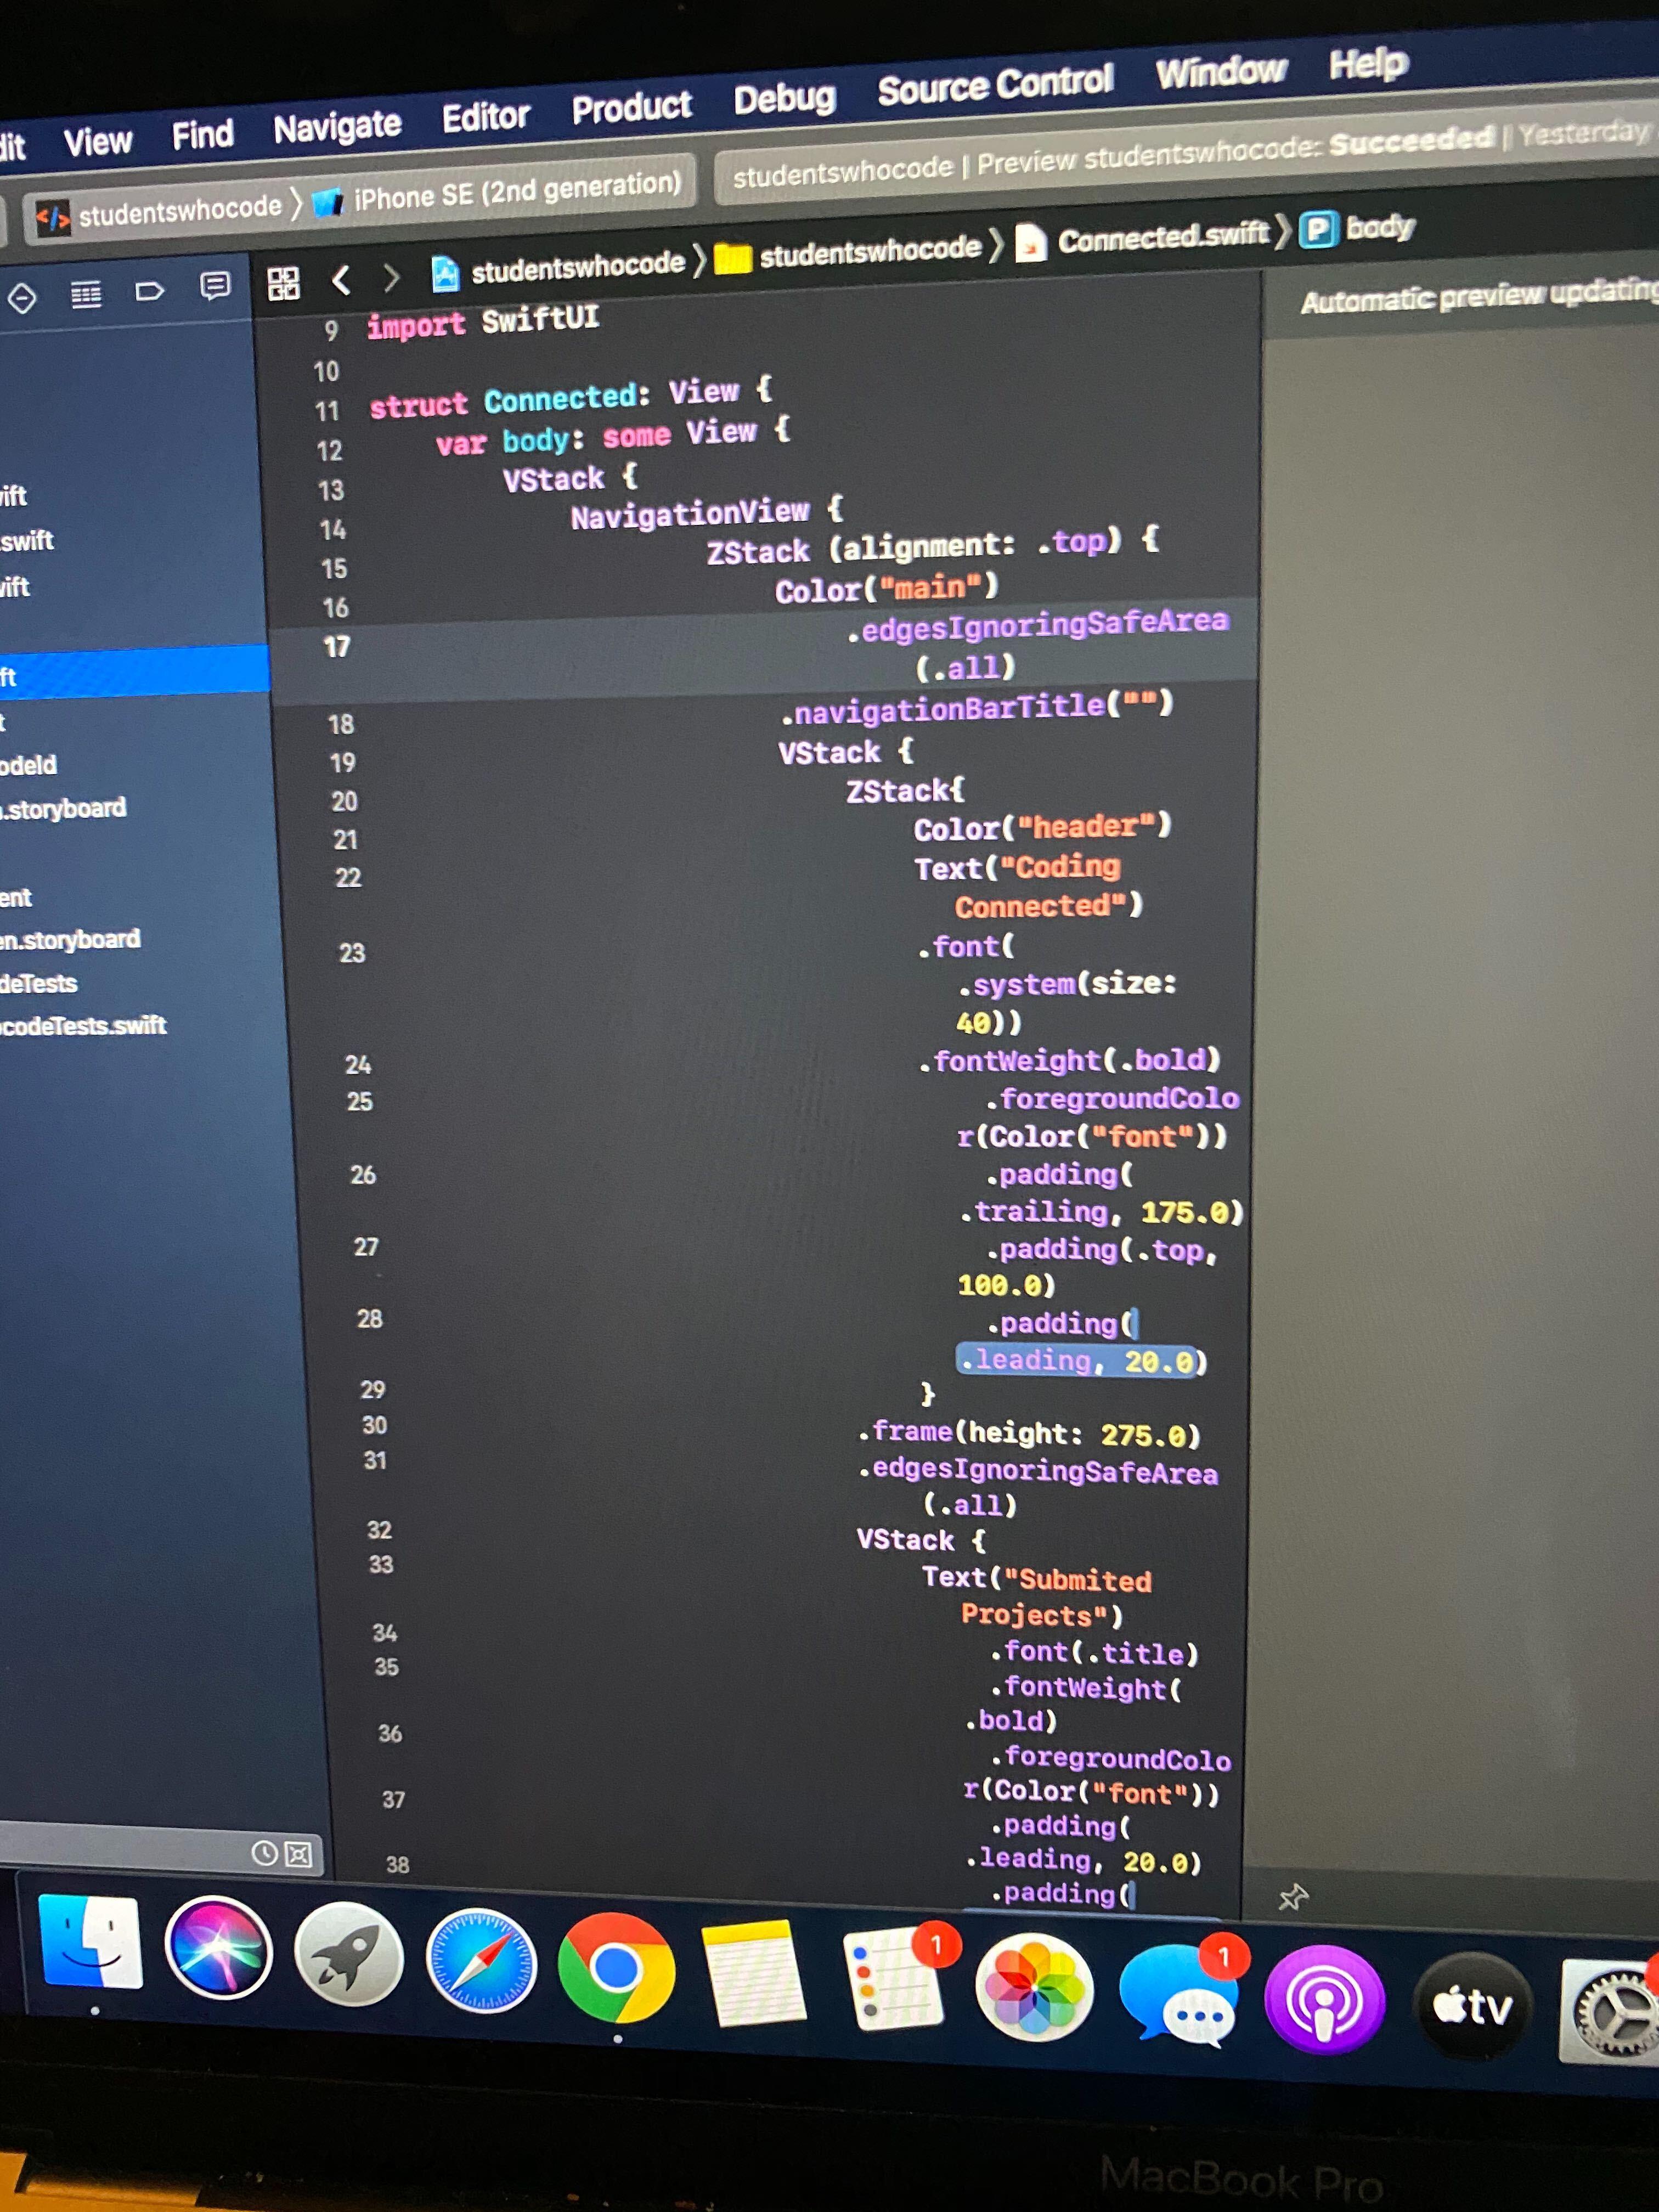 https://cloud-3z8wmnefr.vercel.app/0image_from_ios.jpg